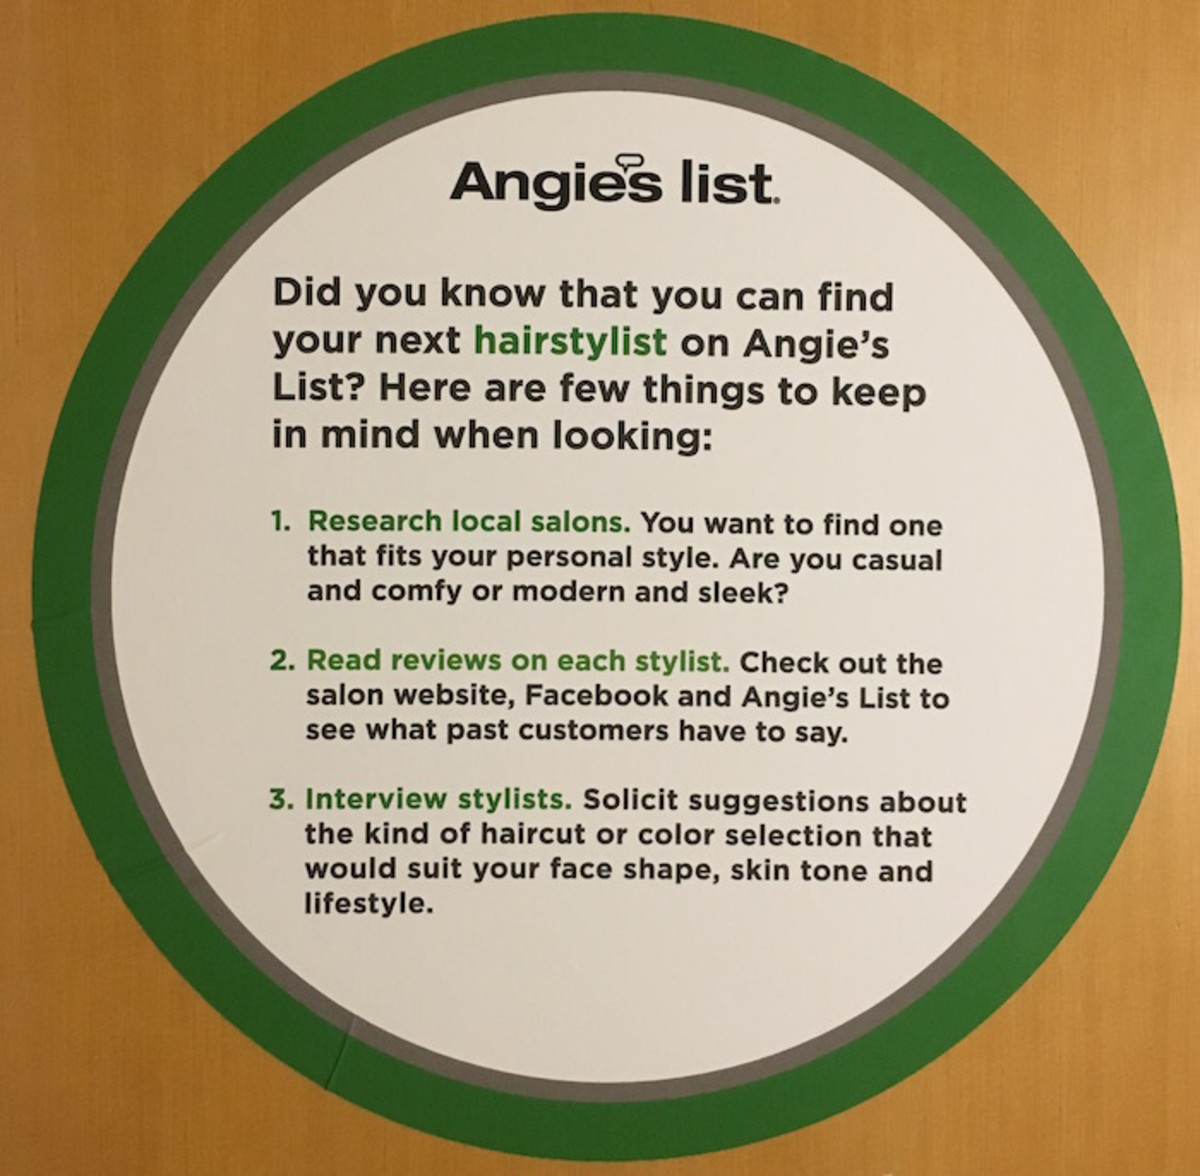 angies list tips